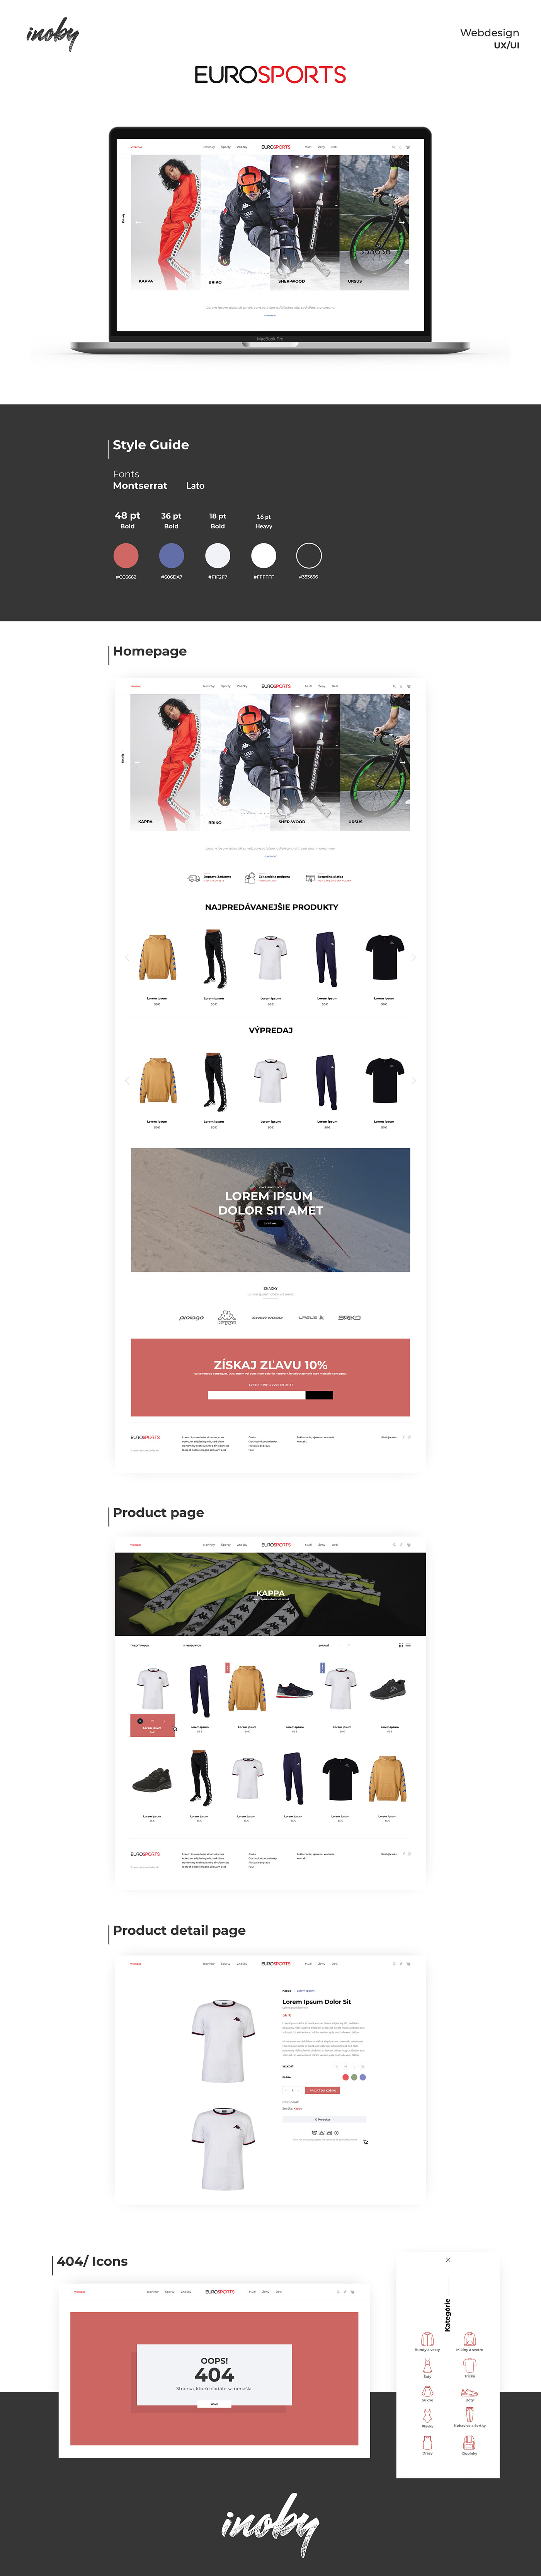 code eshop Online shop shop UI ux Webdesign Website